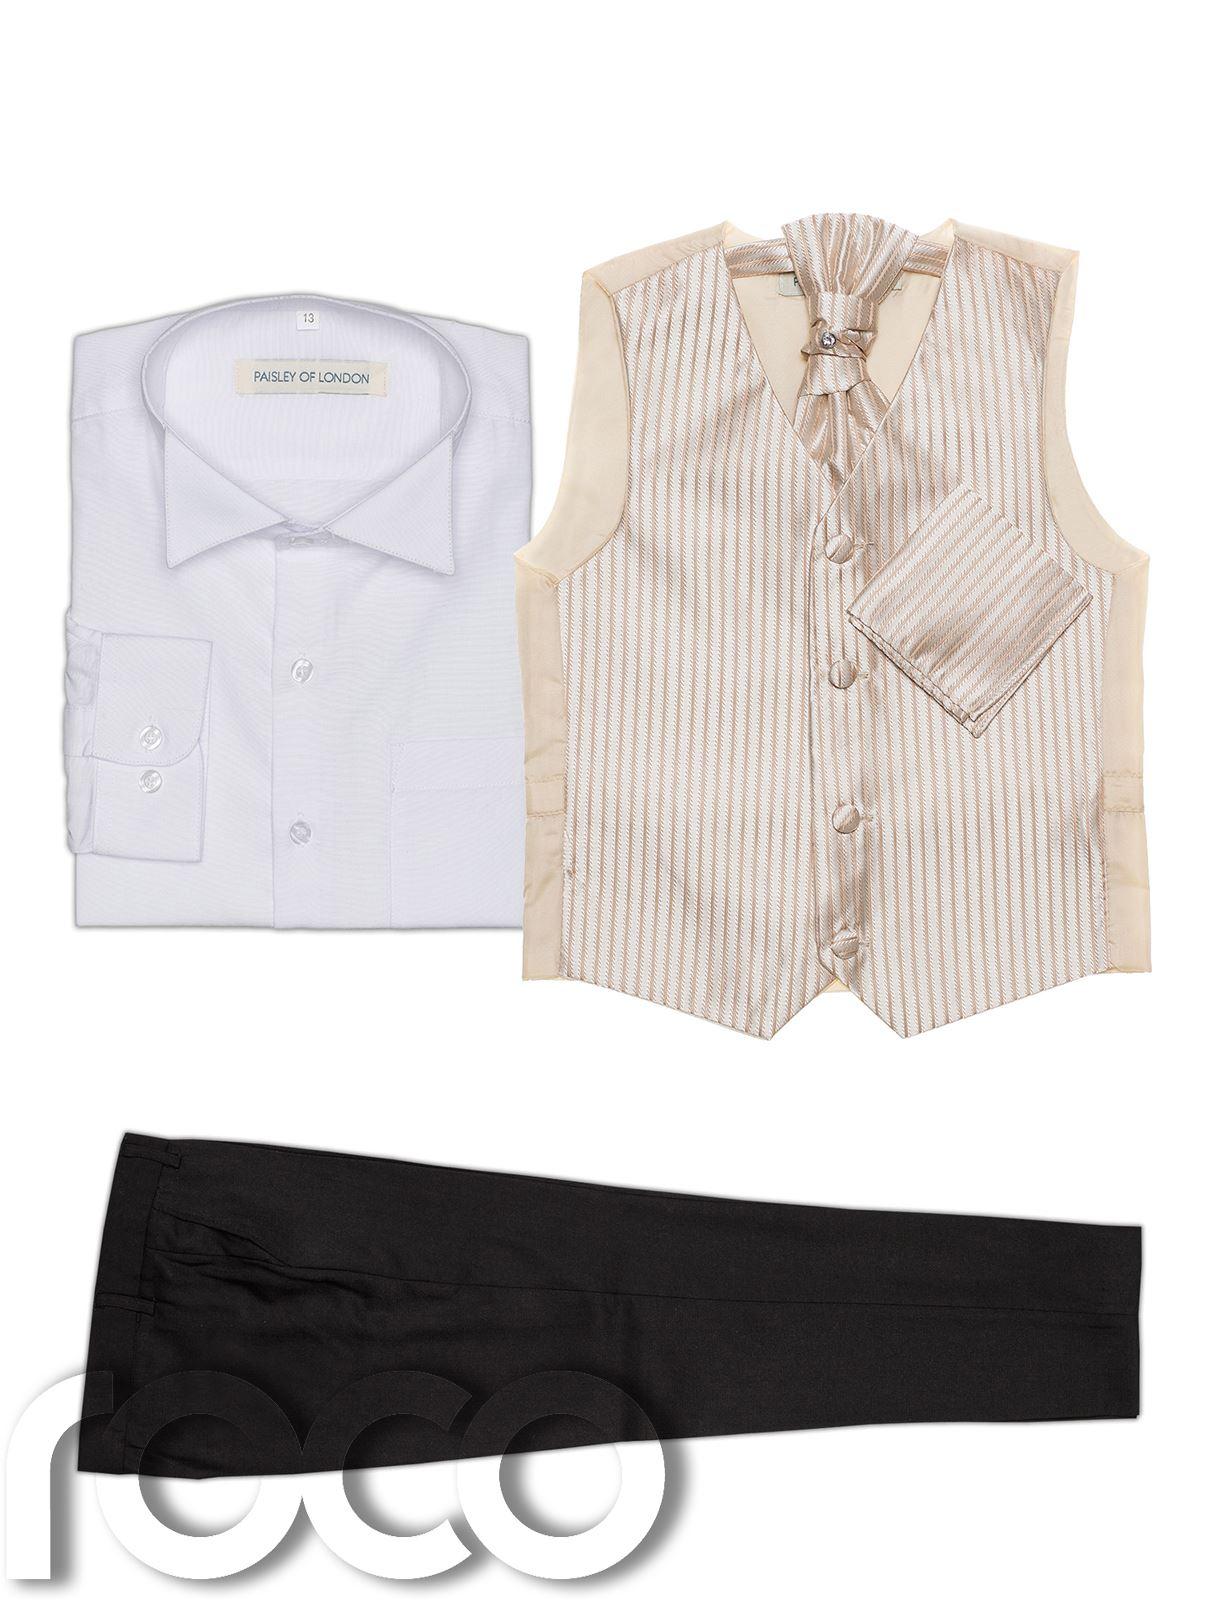 Costume-Bebe-garcon-gilet-PAGE-pour-noir-pantalon-a-rayures-motif